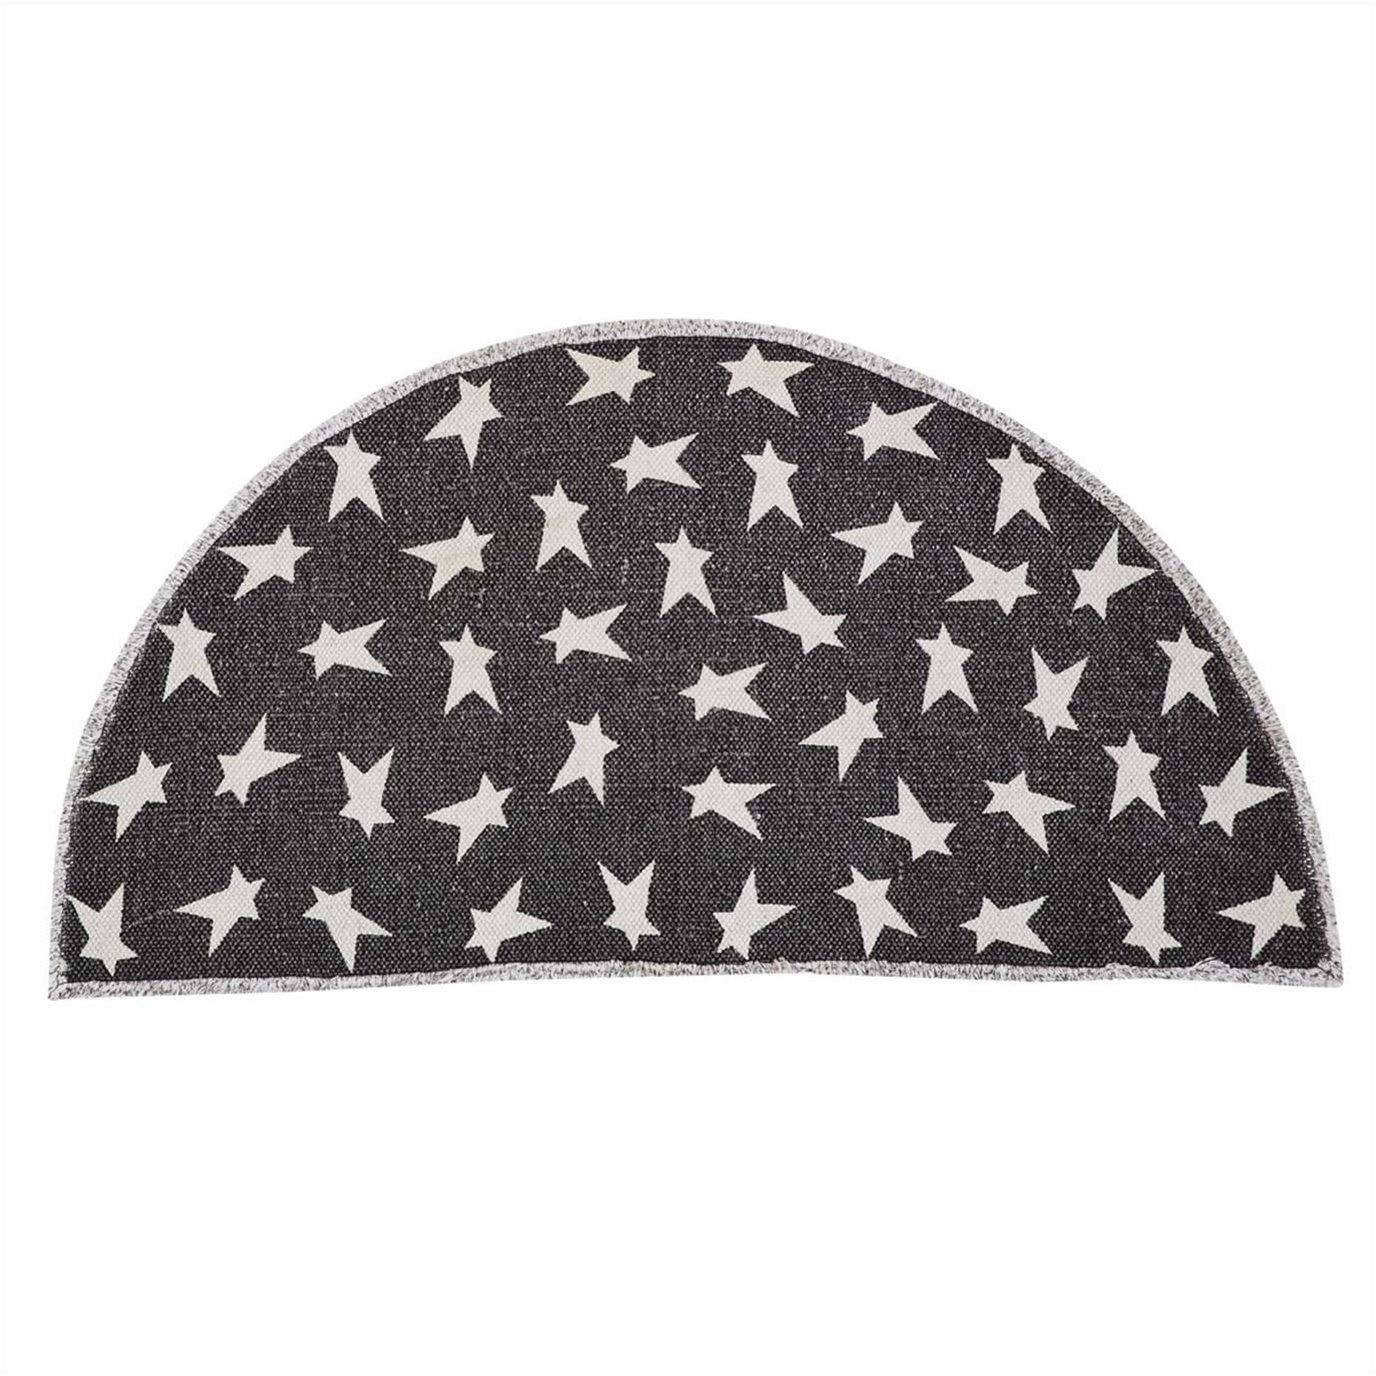 Black Primitive Star Rug Half Circle 16.5x33